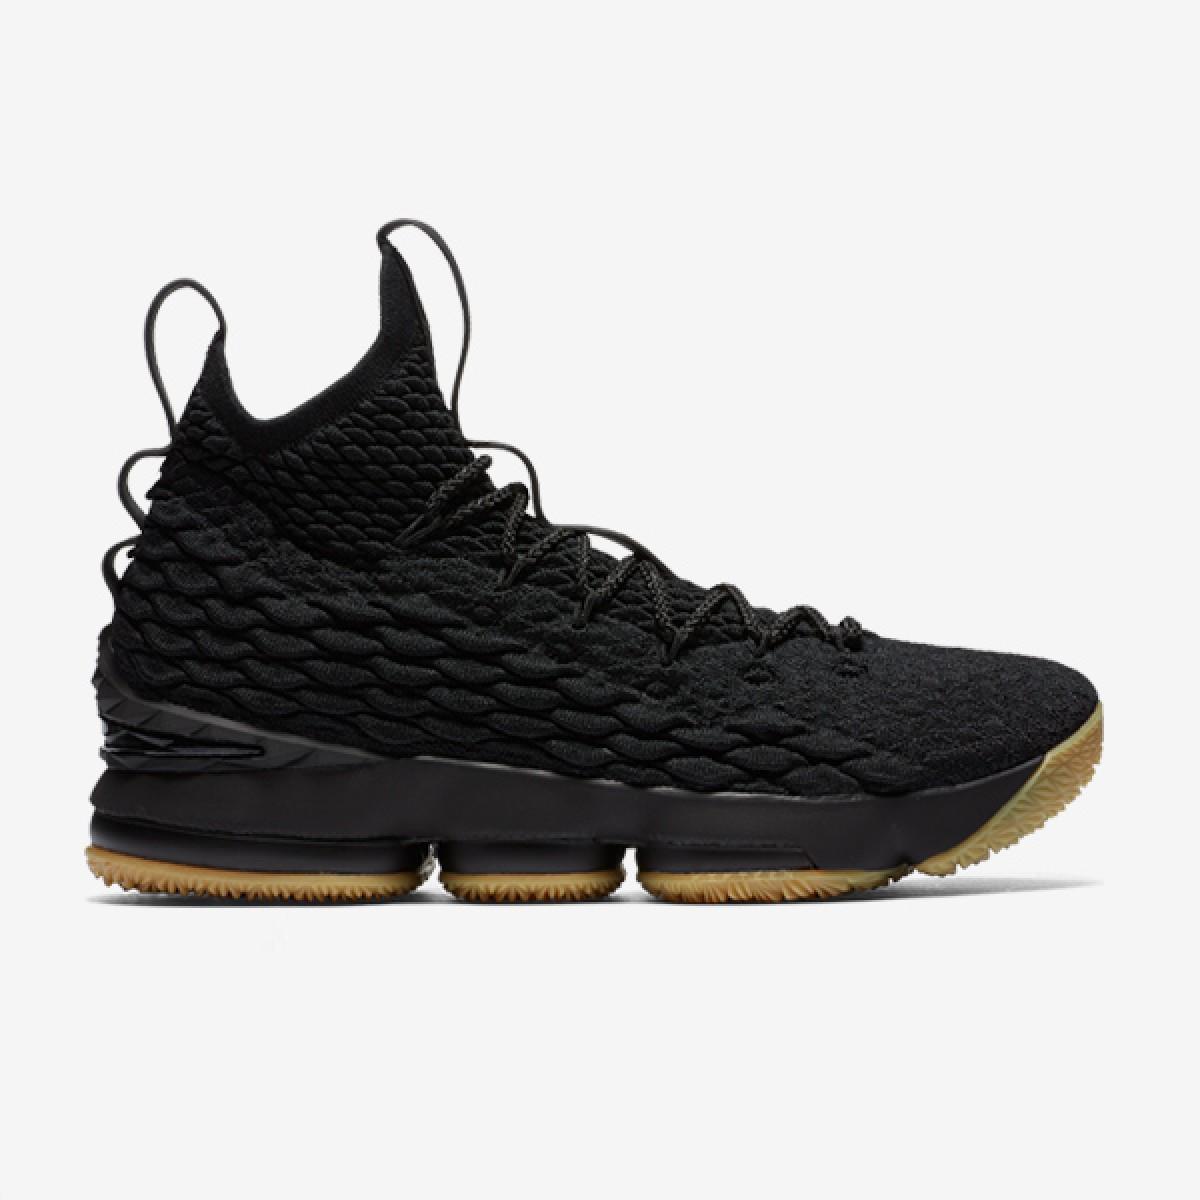 Nike Lebron XV 'Black Gum'